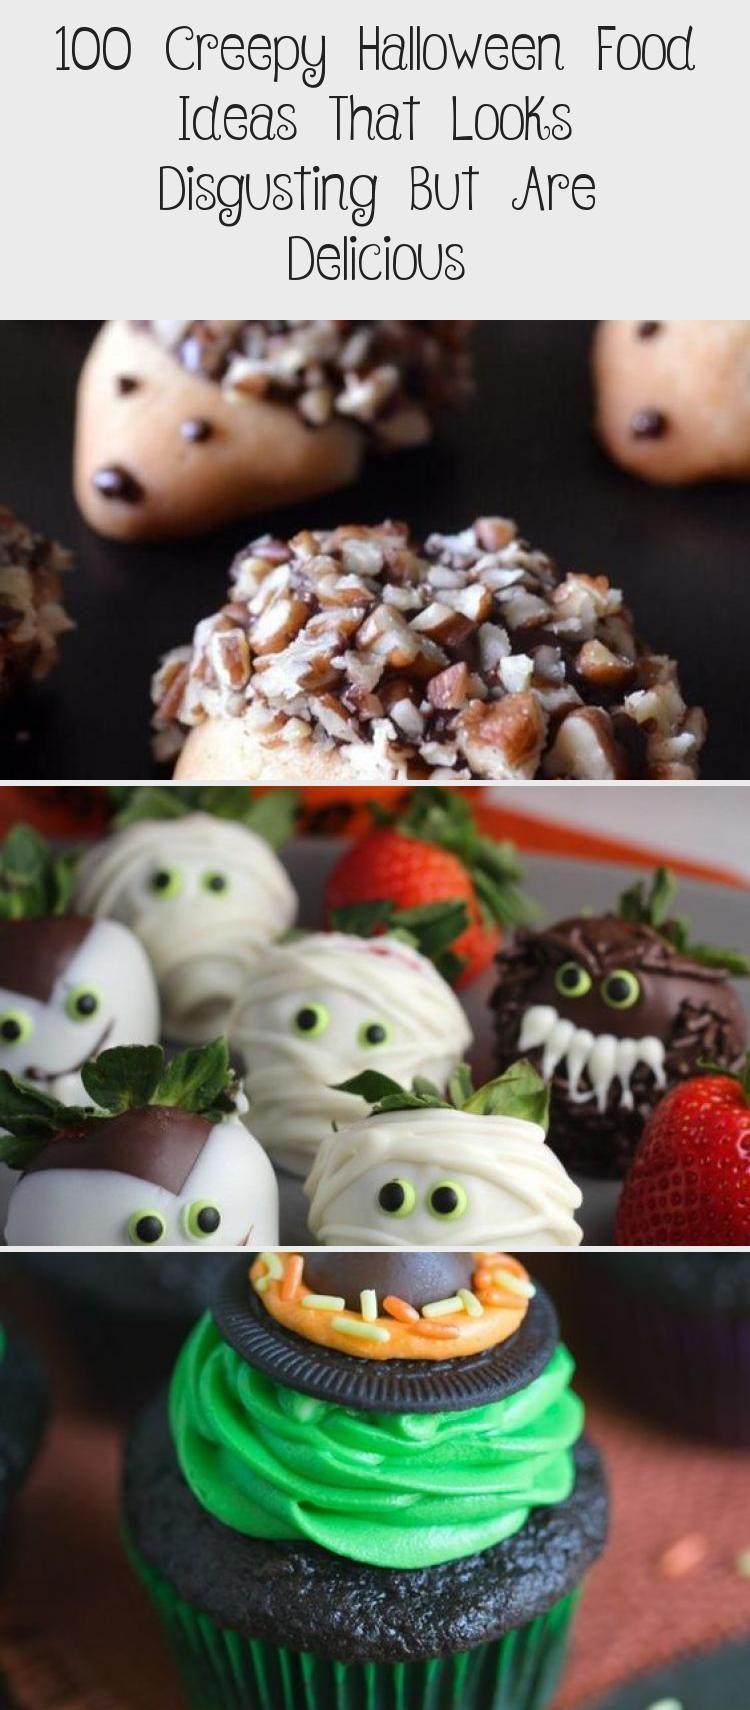 100 Creepy Halloween Food ideas that looks disgusting but